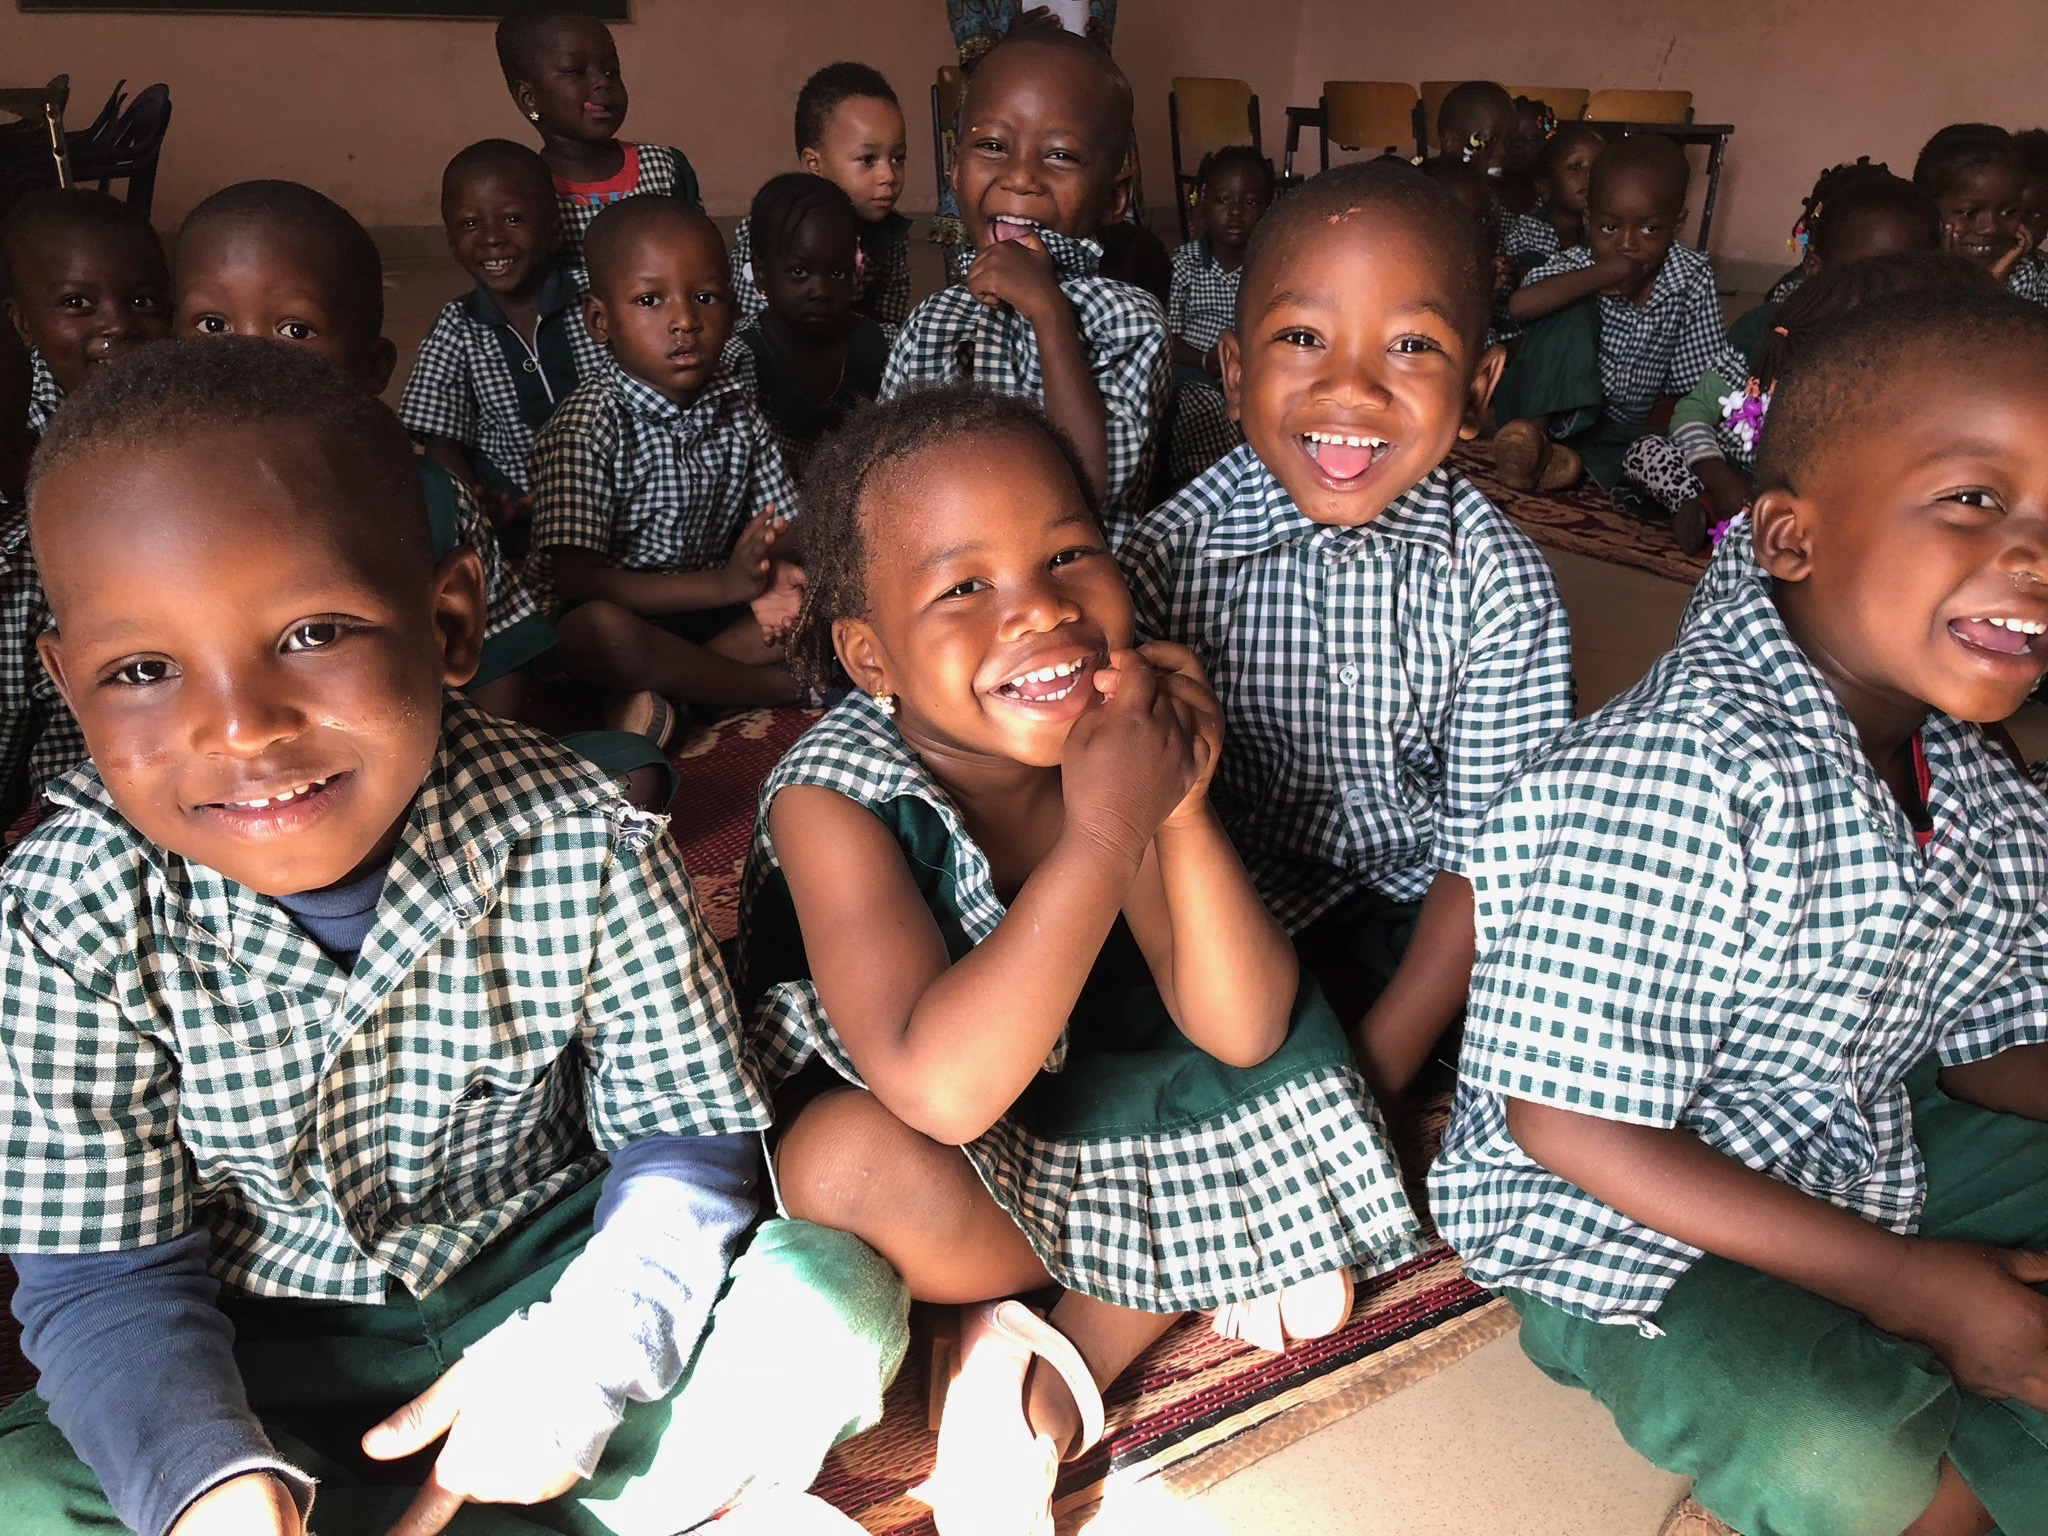 Smiling children in West Africa